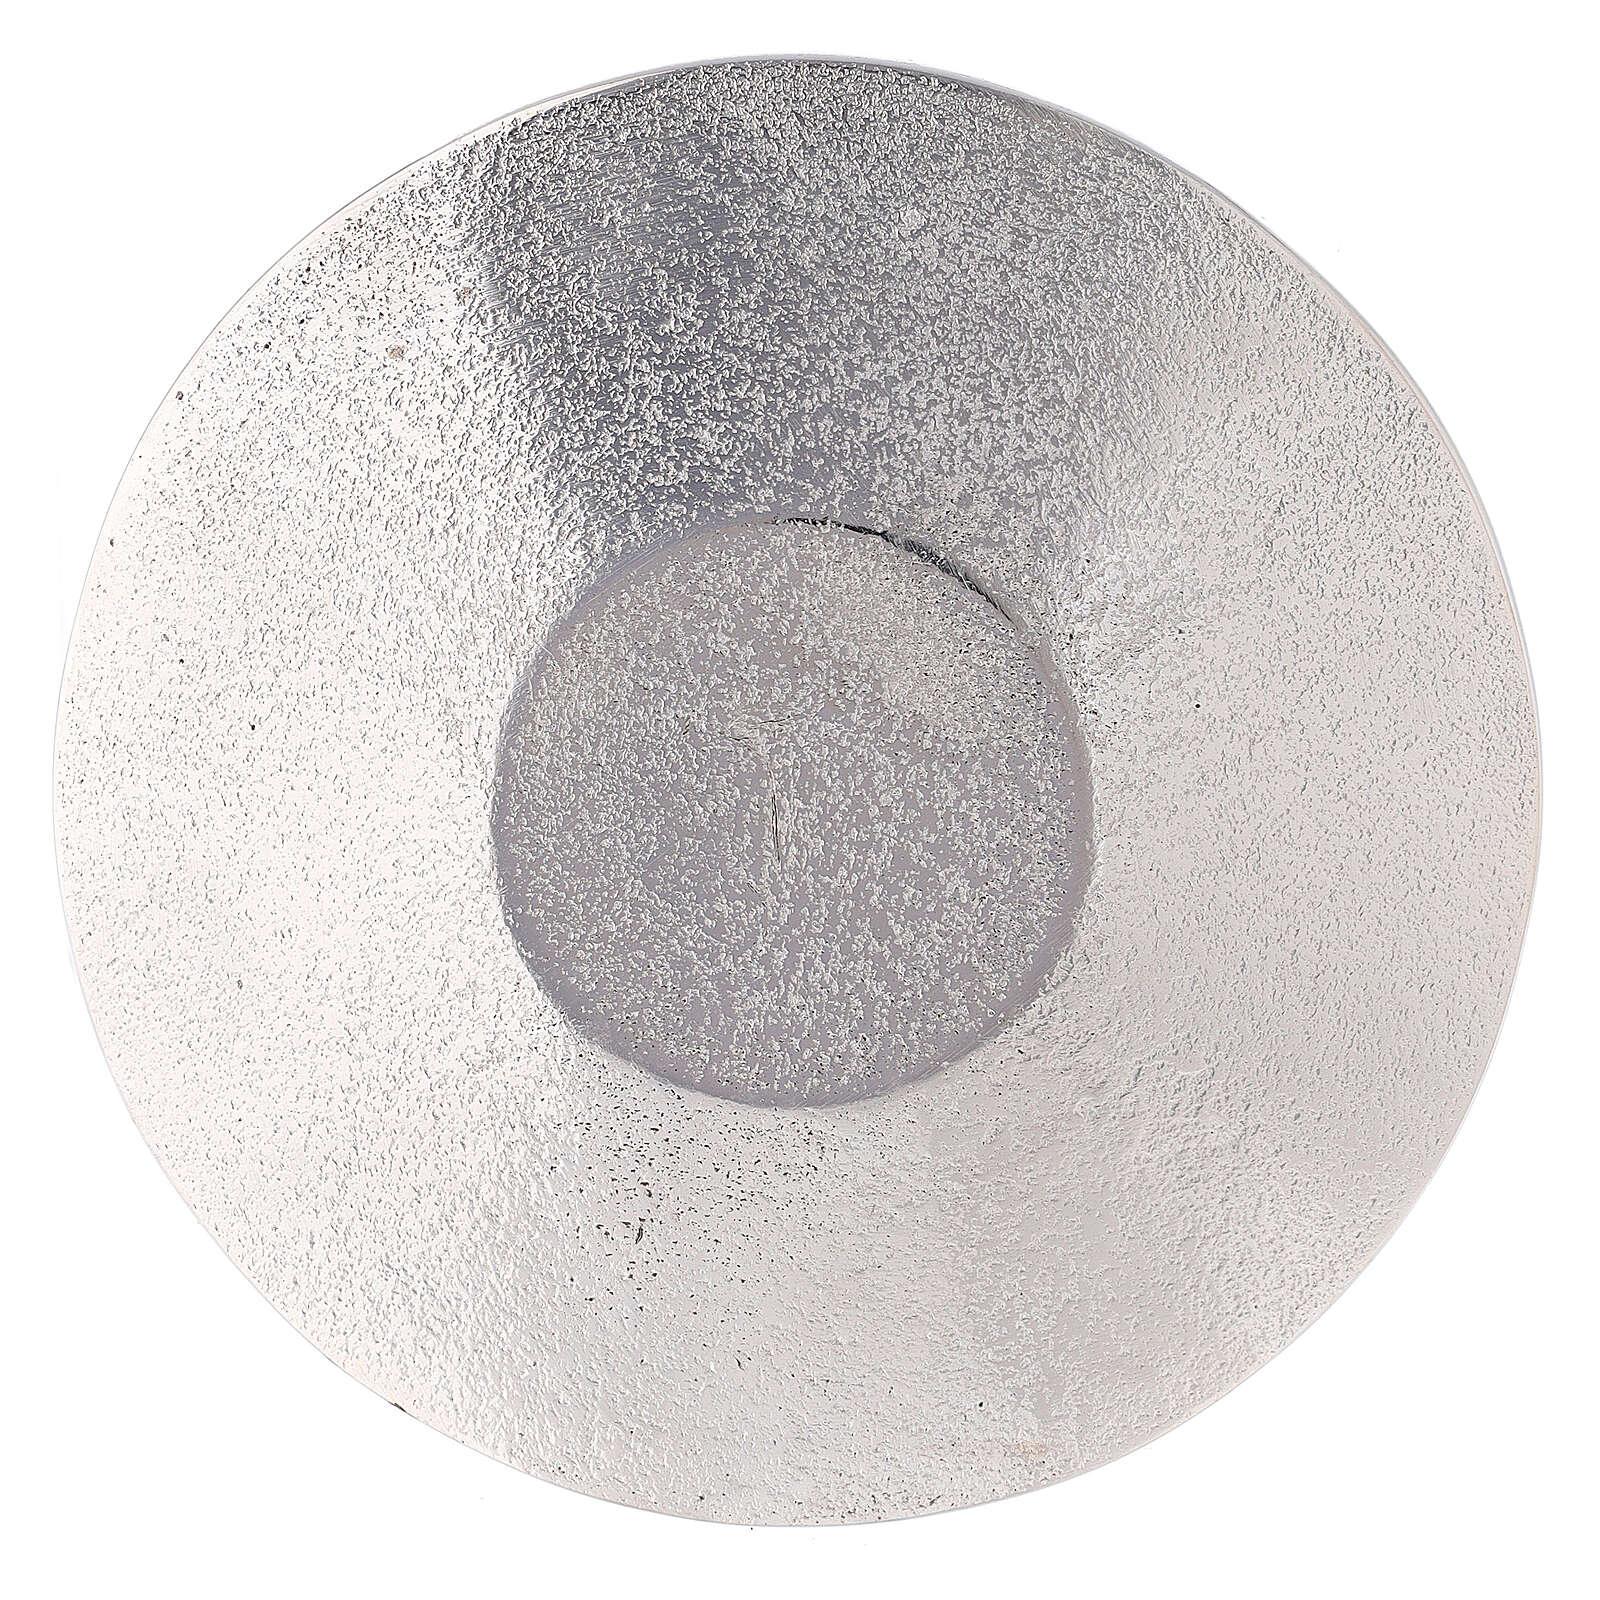 Piatto portacandela nido ape alluminio diametro 14 cm 3